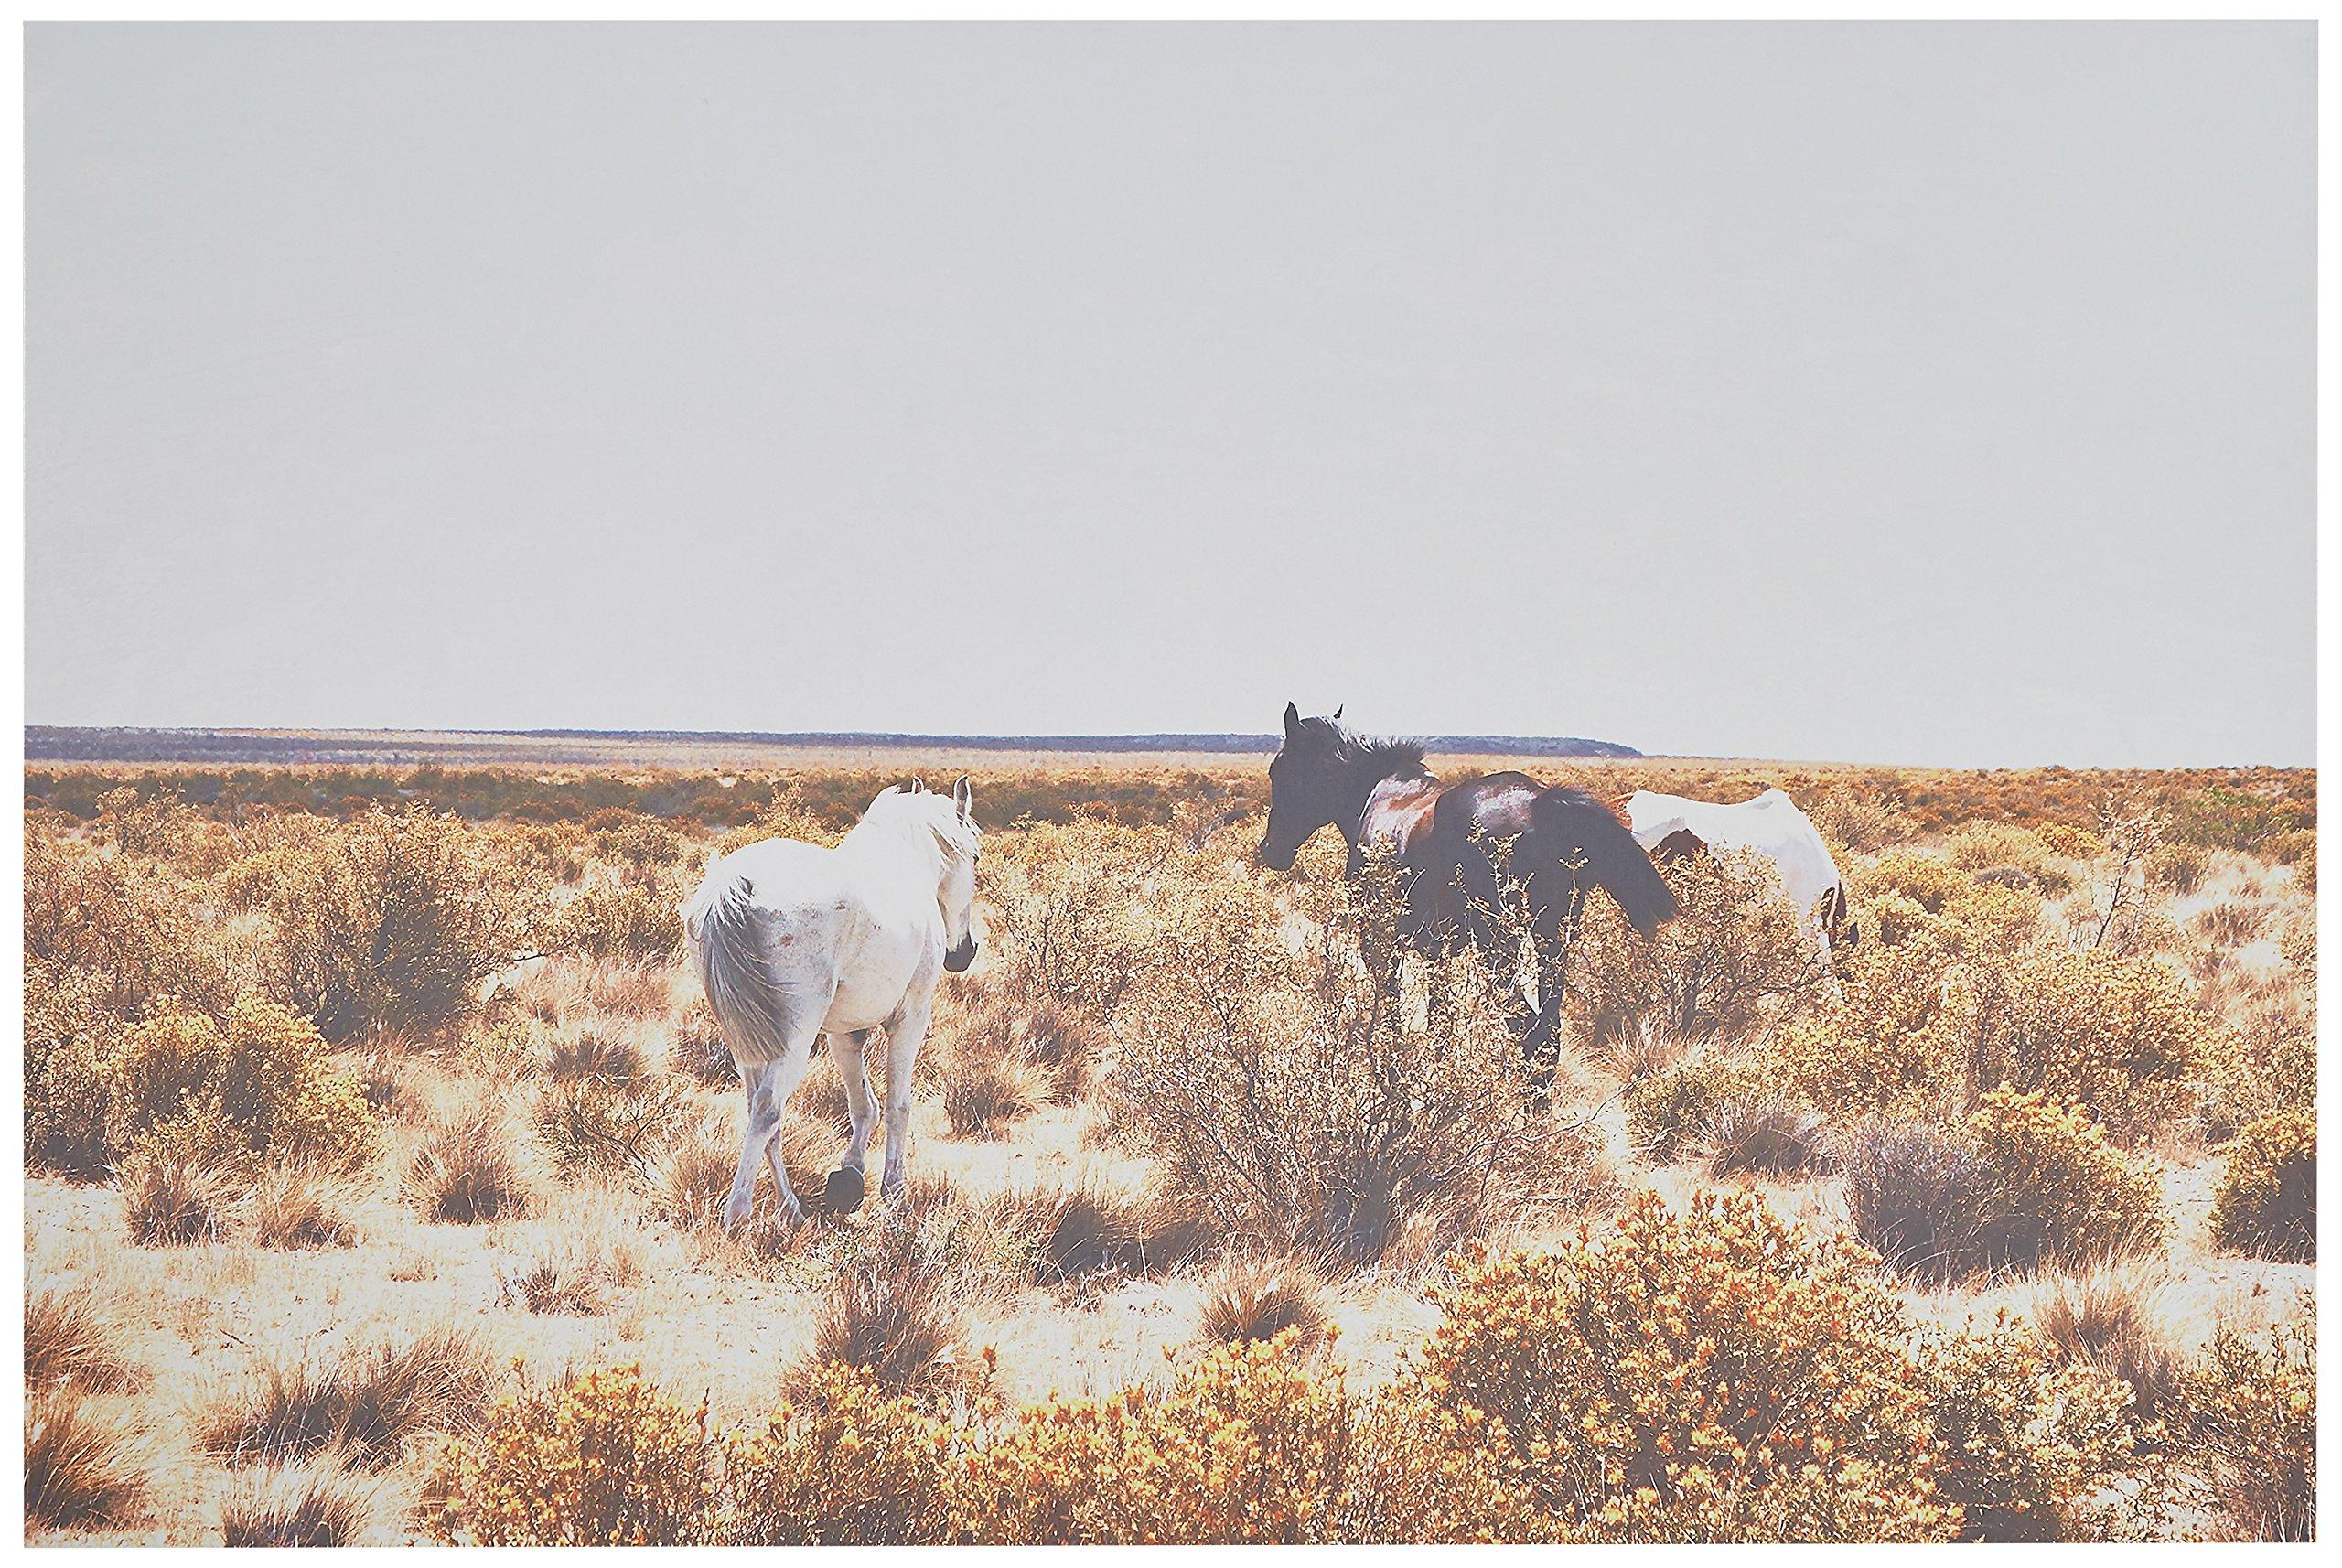 Canvas Print of Horses Grazing in Southwest Desert, 36'' x 24''